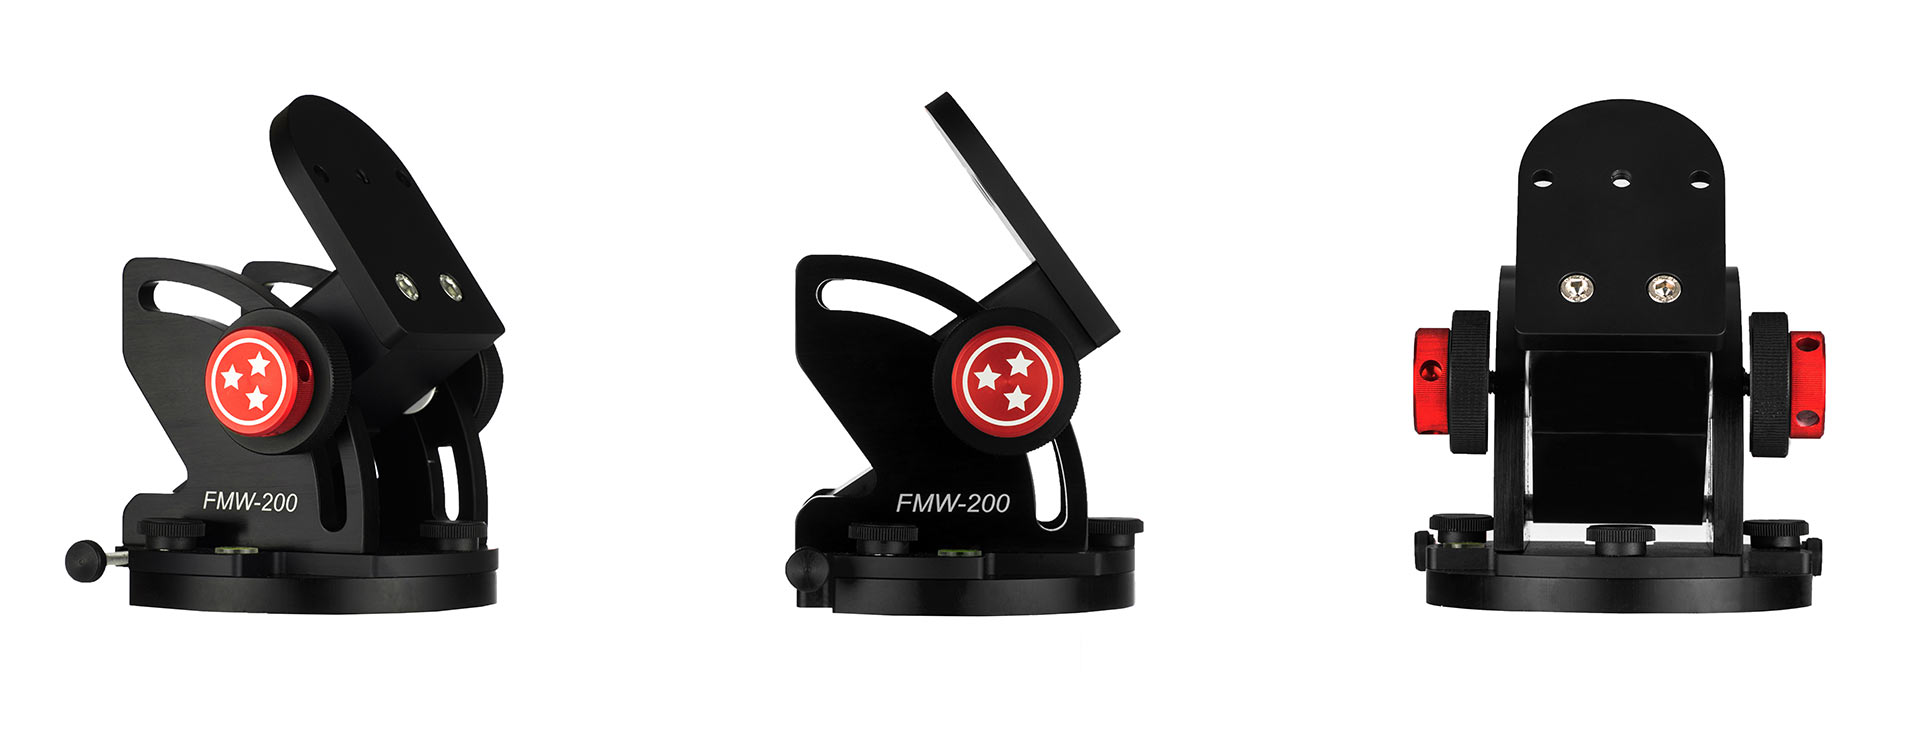 FMW 200 Products